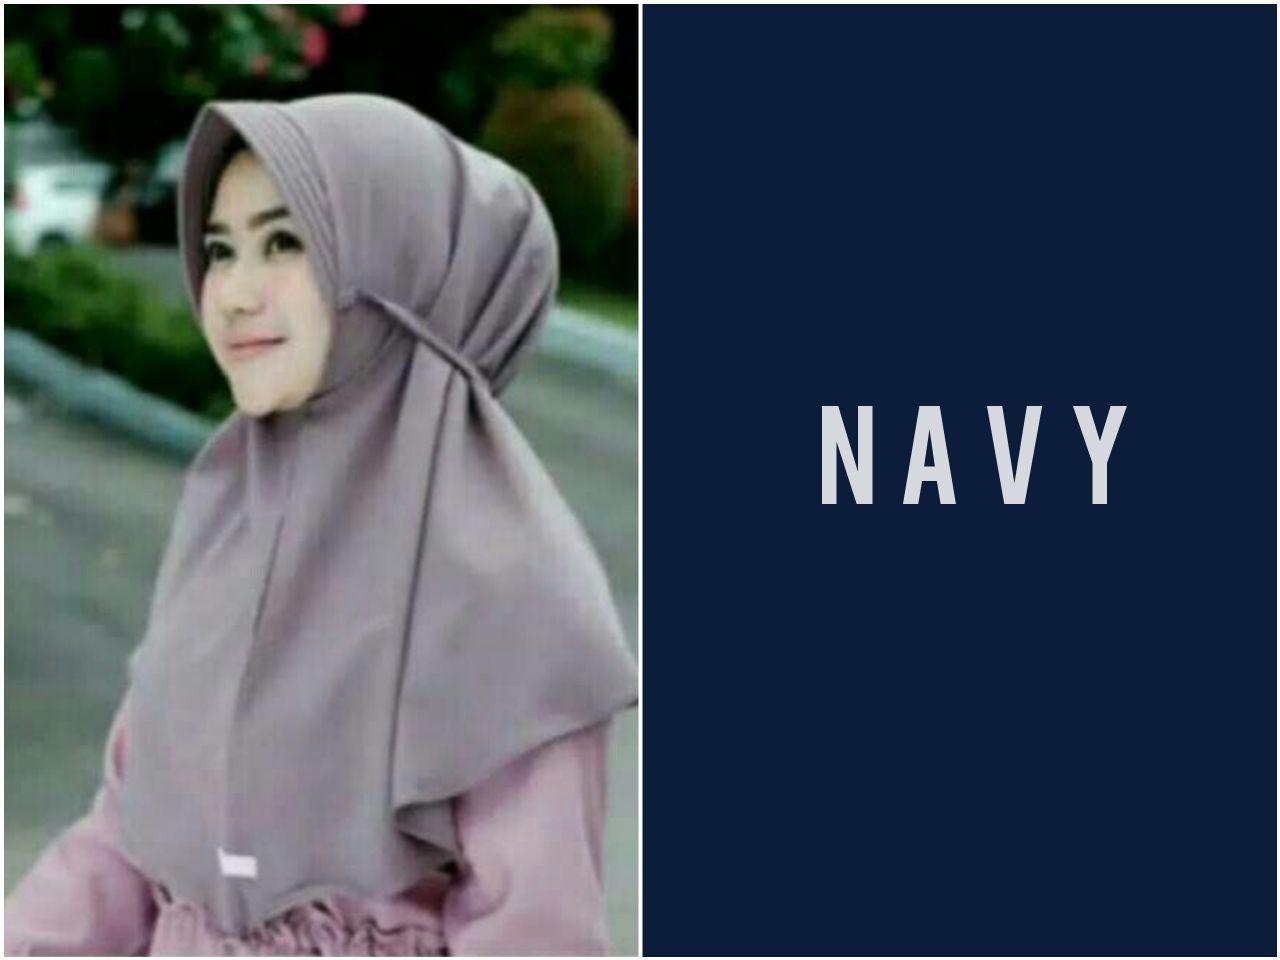 Purplelily Khimar Pet Laser jilbab hijab. IDR 19,500 IDR19500. View Detail. Khimar Pet Tali